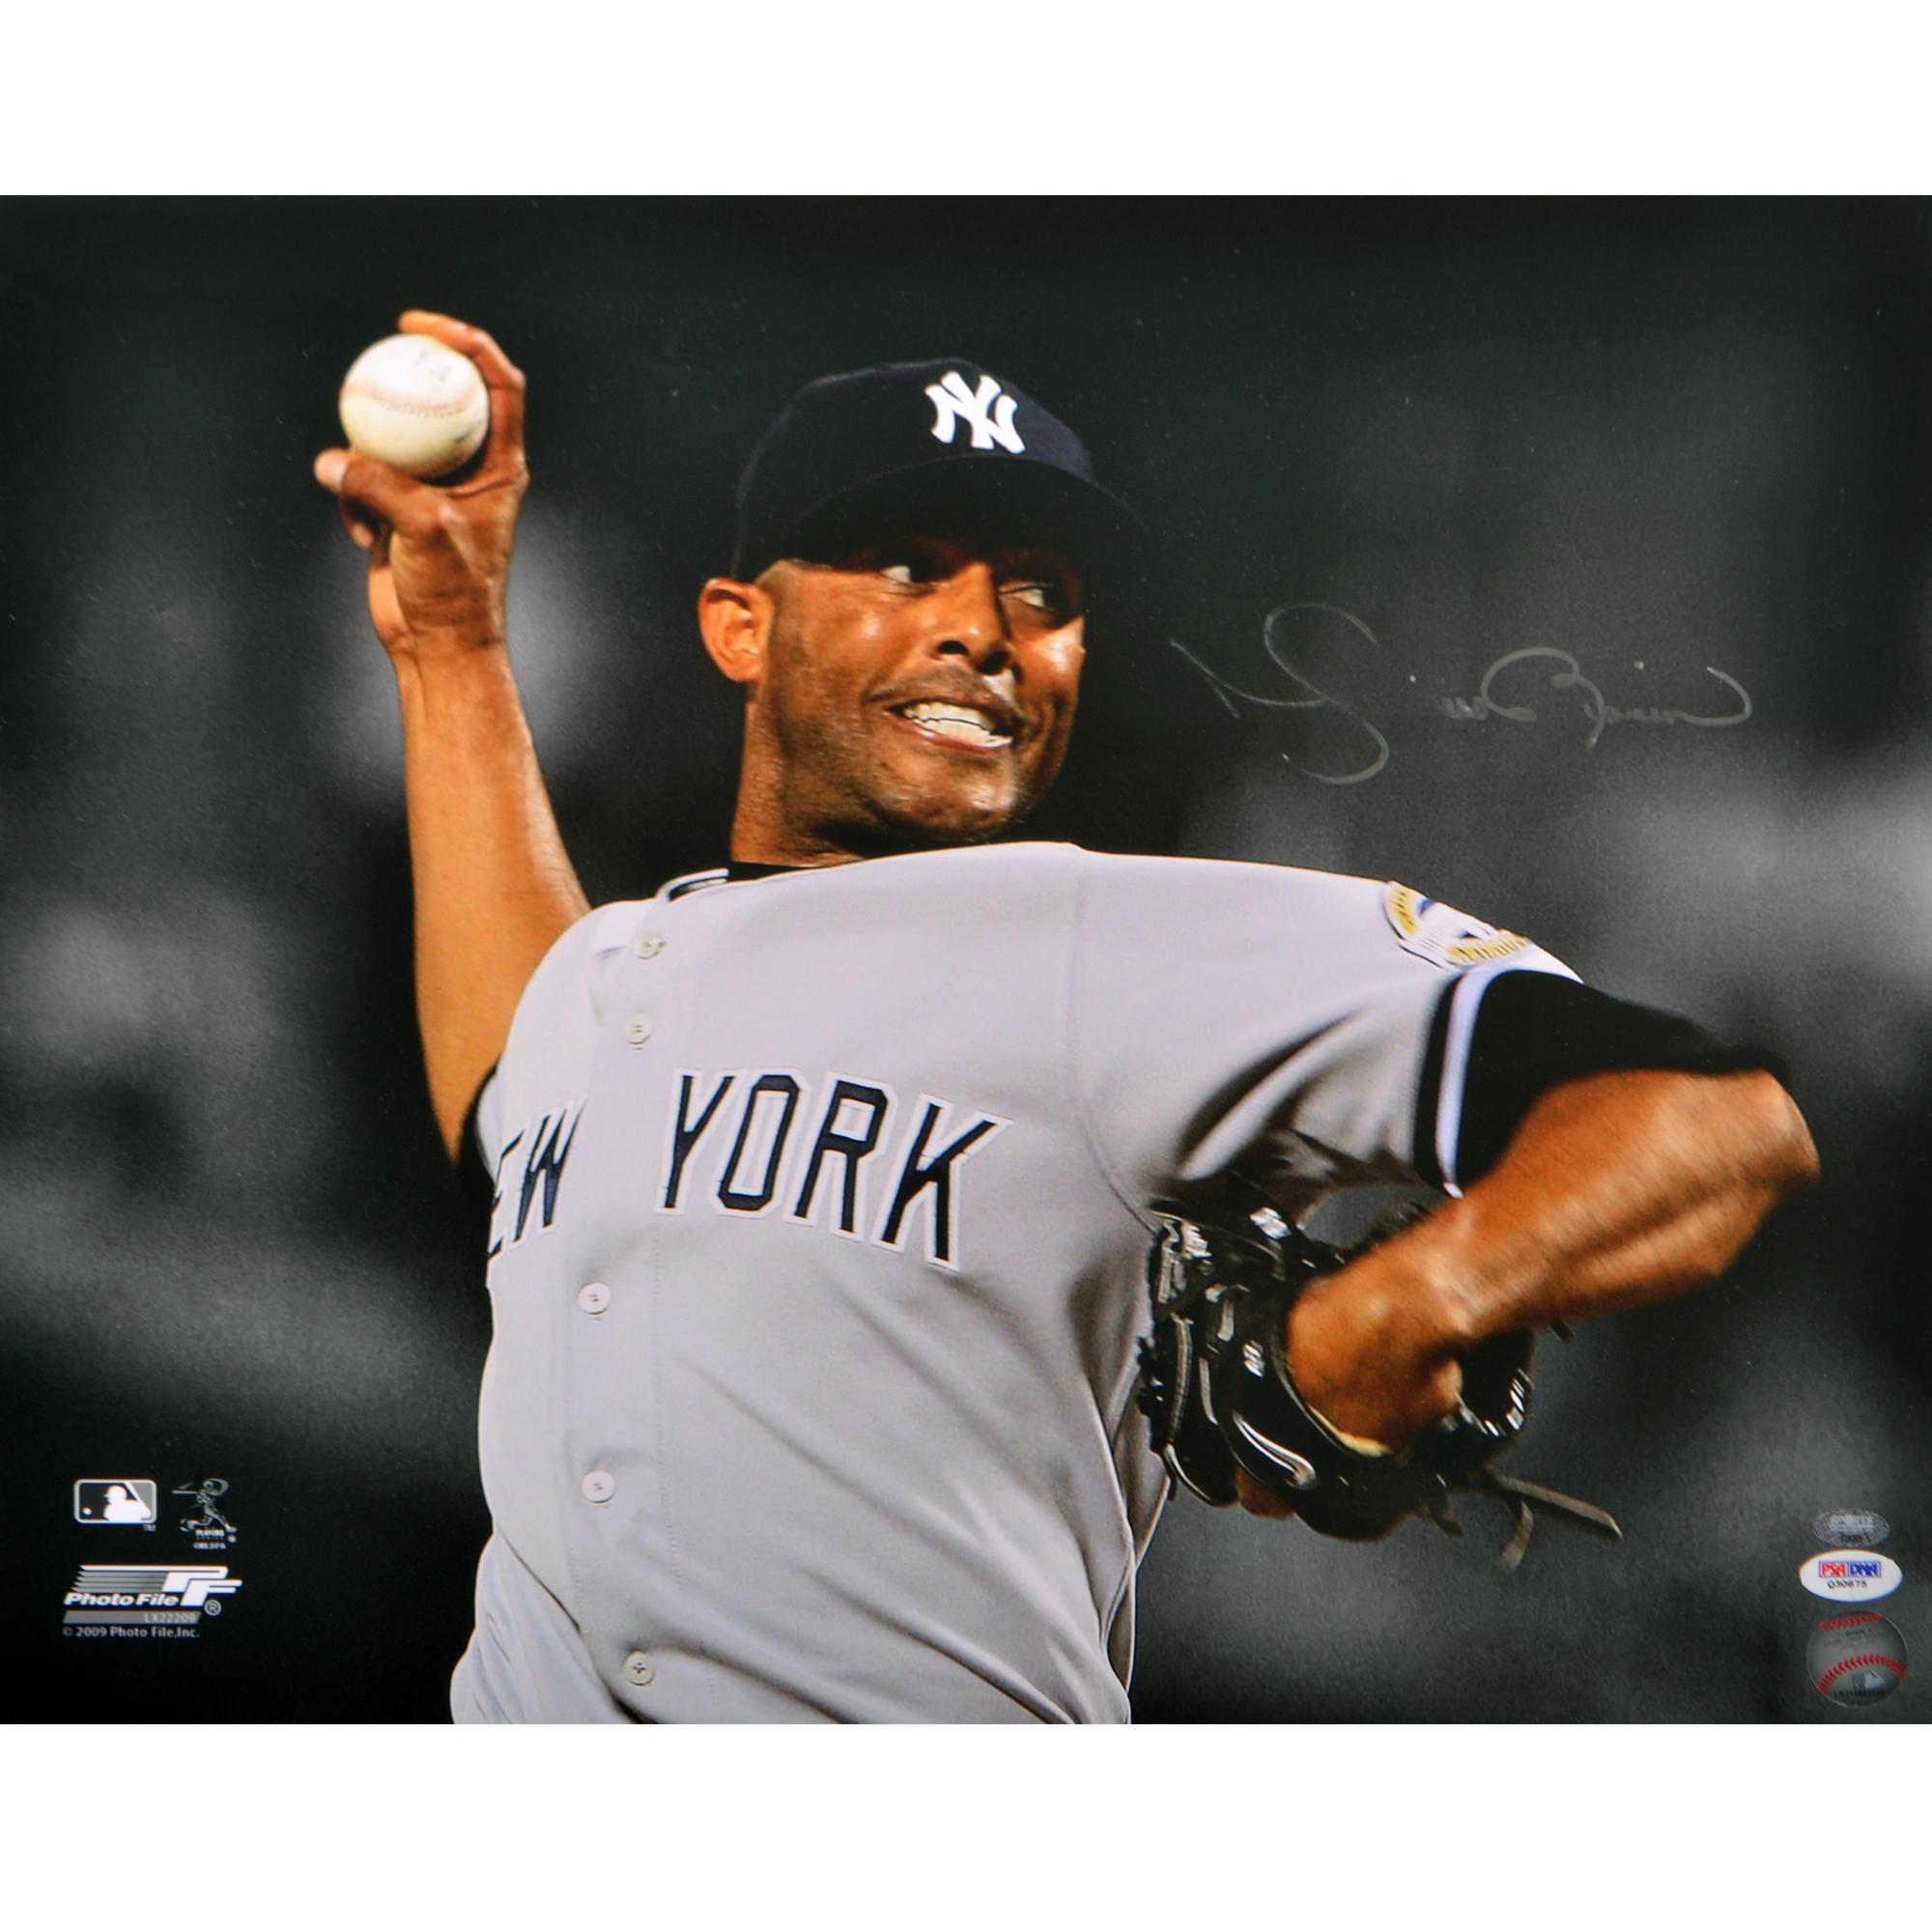 Mariano Rivera Signed 16x20 Photo Psa Dna Smudged 8x10 Photo Photo Fun Sports